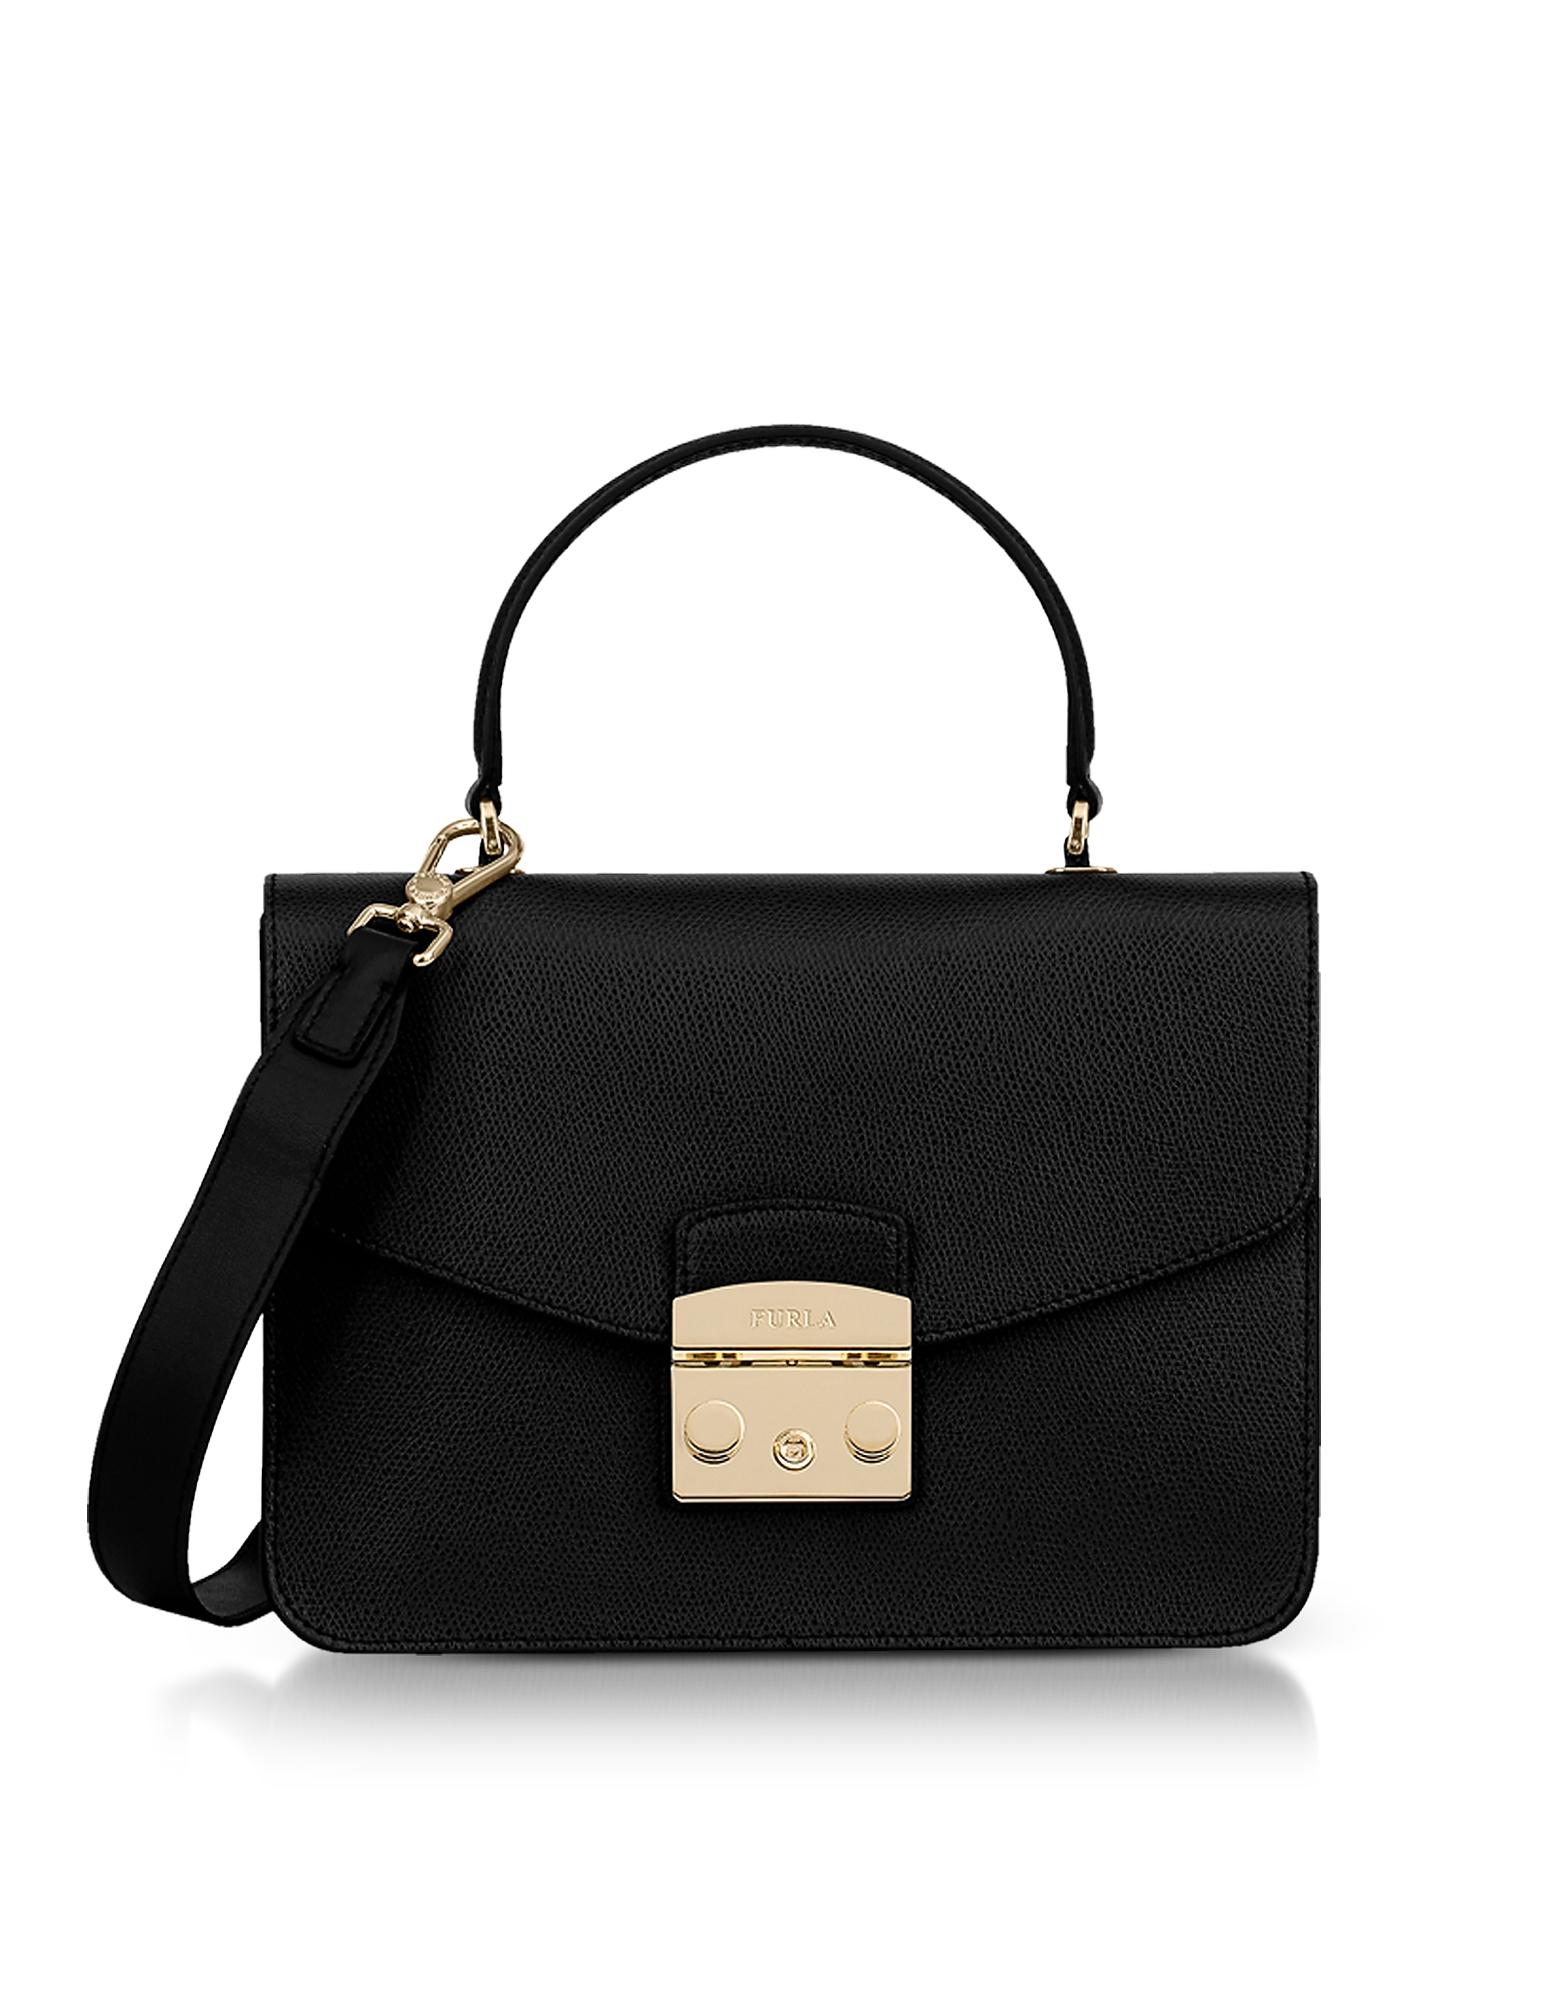 Image of Furla Designer Handbags, Onyx Lizard Printed Leather Metropolis Small Top-Handle Shoulder Bag